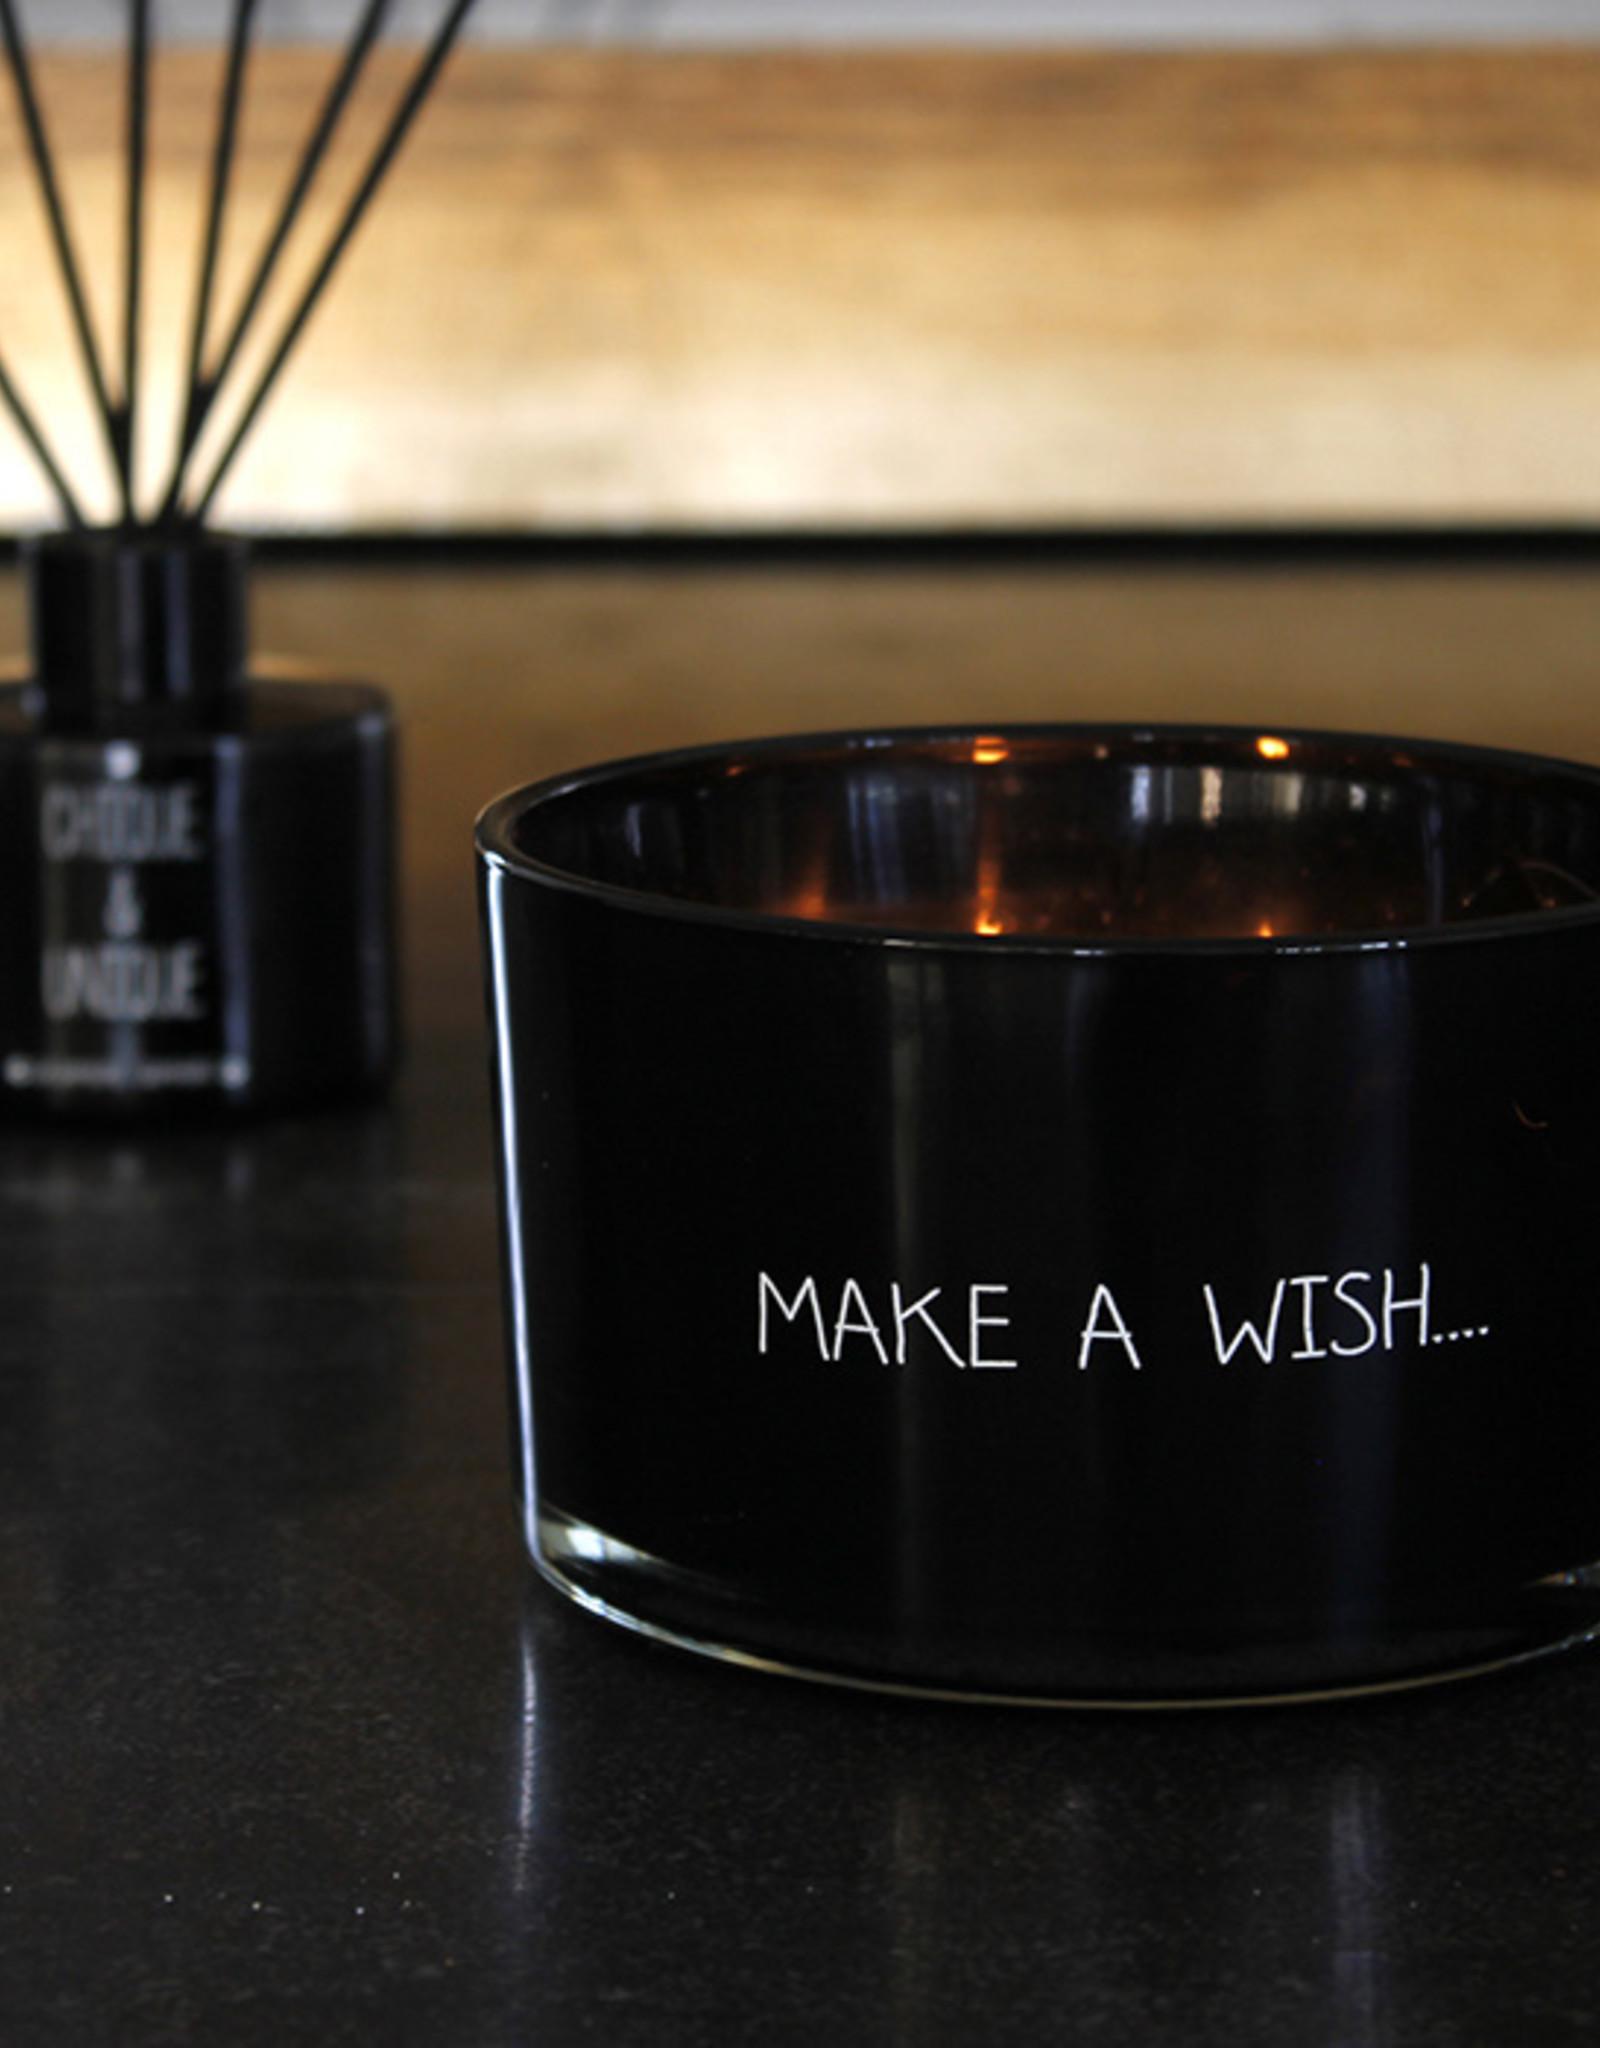 My Flame Sojakaars - Make a wish